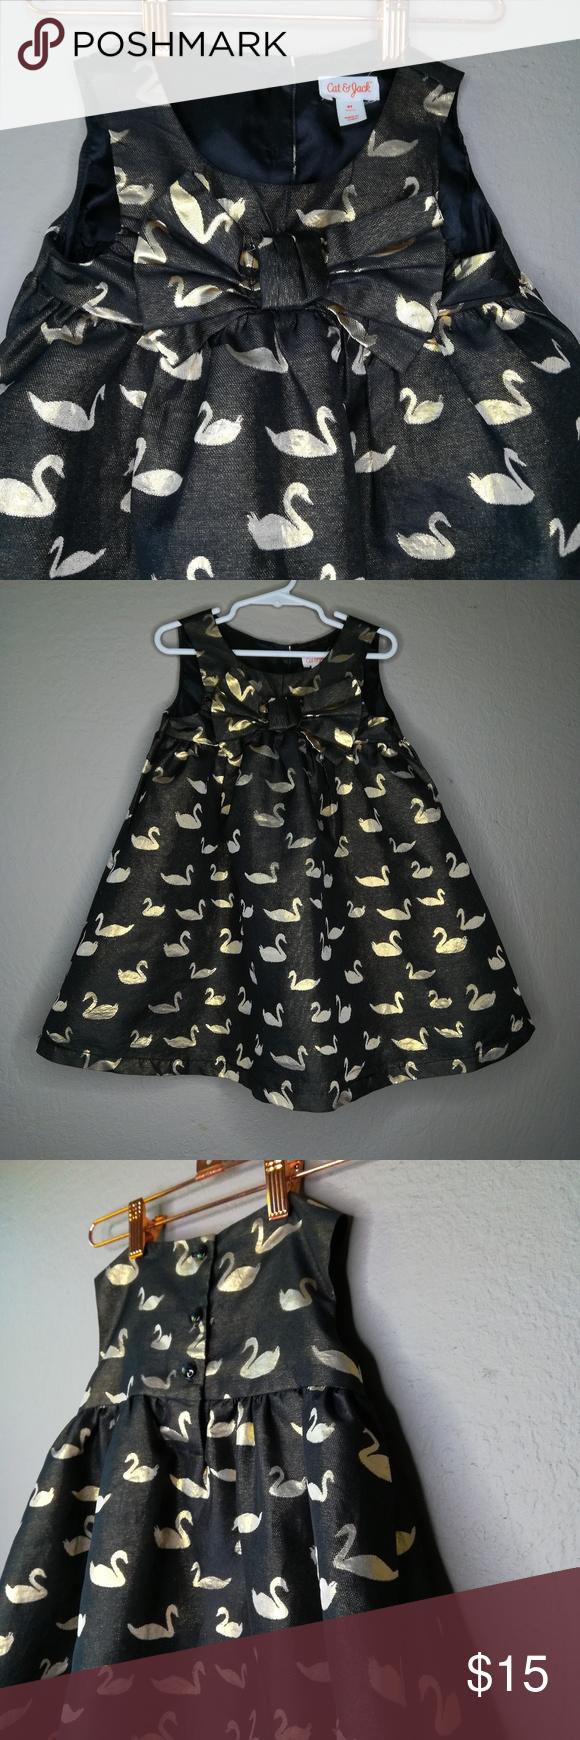 Gold Swan Black Cat Jack 4t Party Dress Metallic Gold And Black Dress Little Dresses Party Dress [ 1740 x 580 Pixel ]